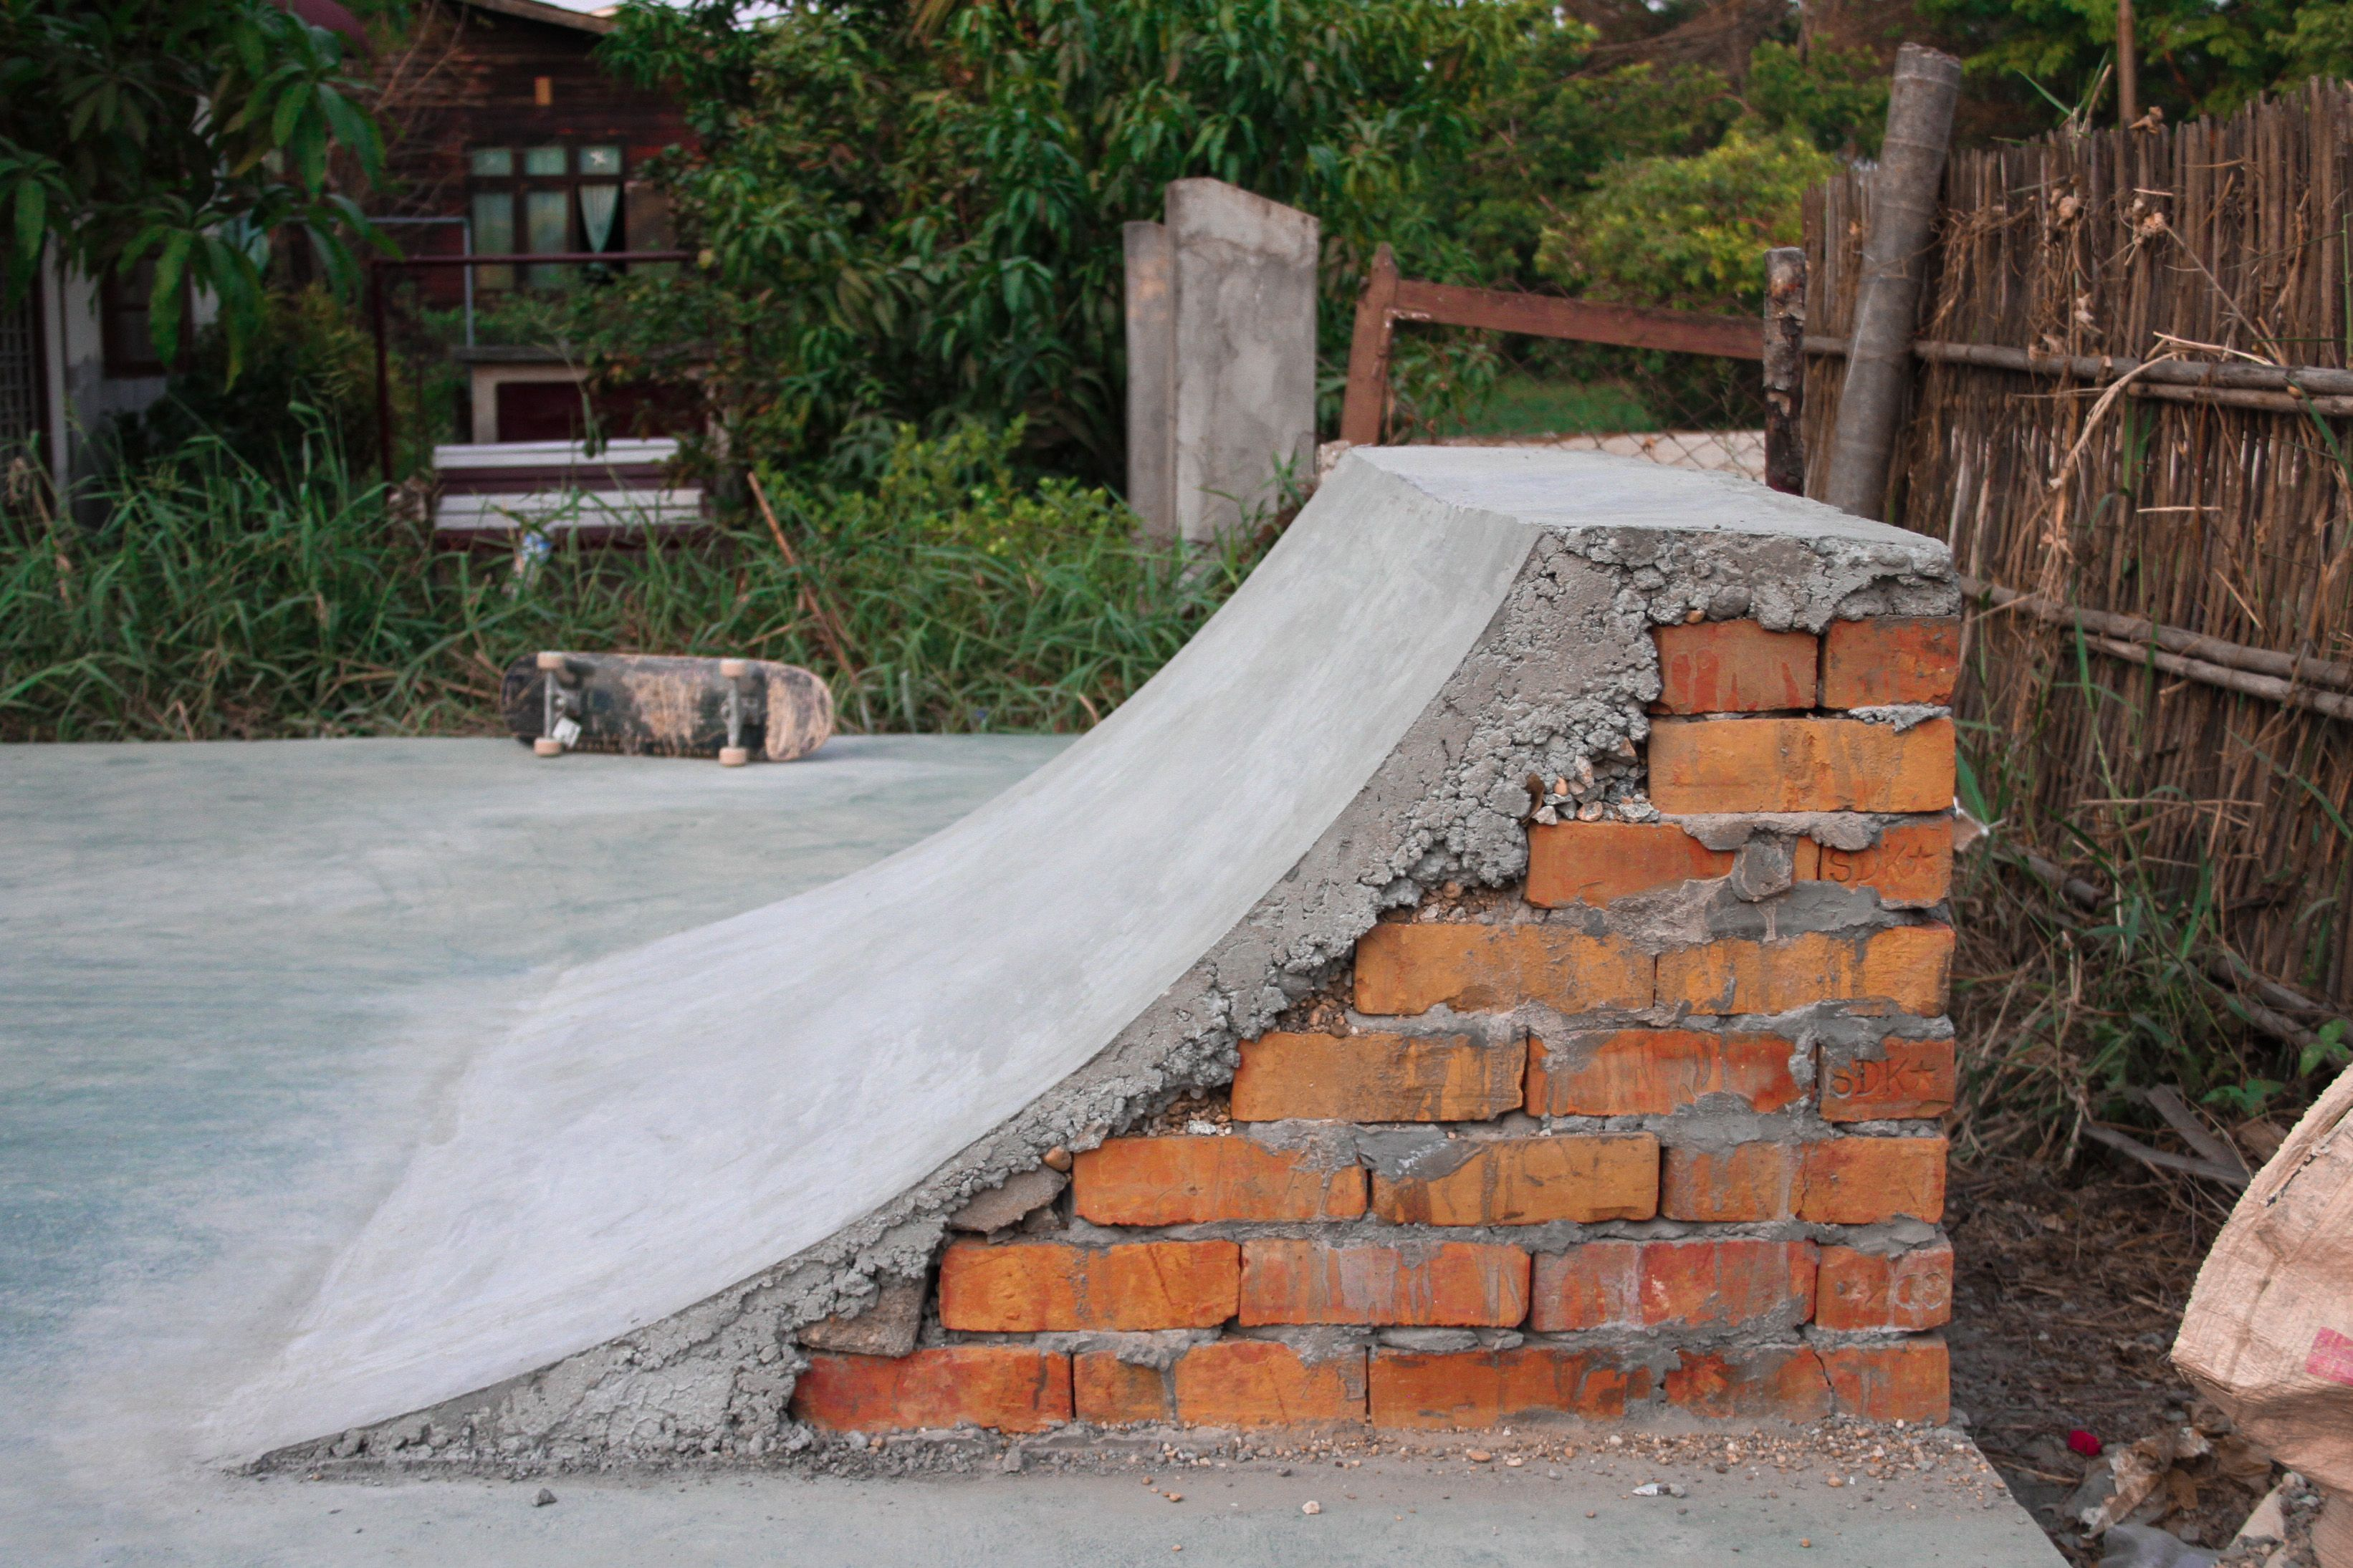 Free mini halfpipe plans - Ramphelp Com How To Build A Skate Ramp Free Skateboard Ramp Plans Pinterest Skateboard Skateboard Ramps And Mini Ramp